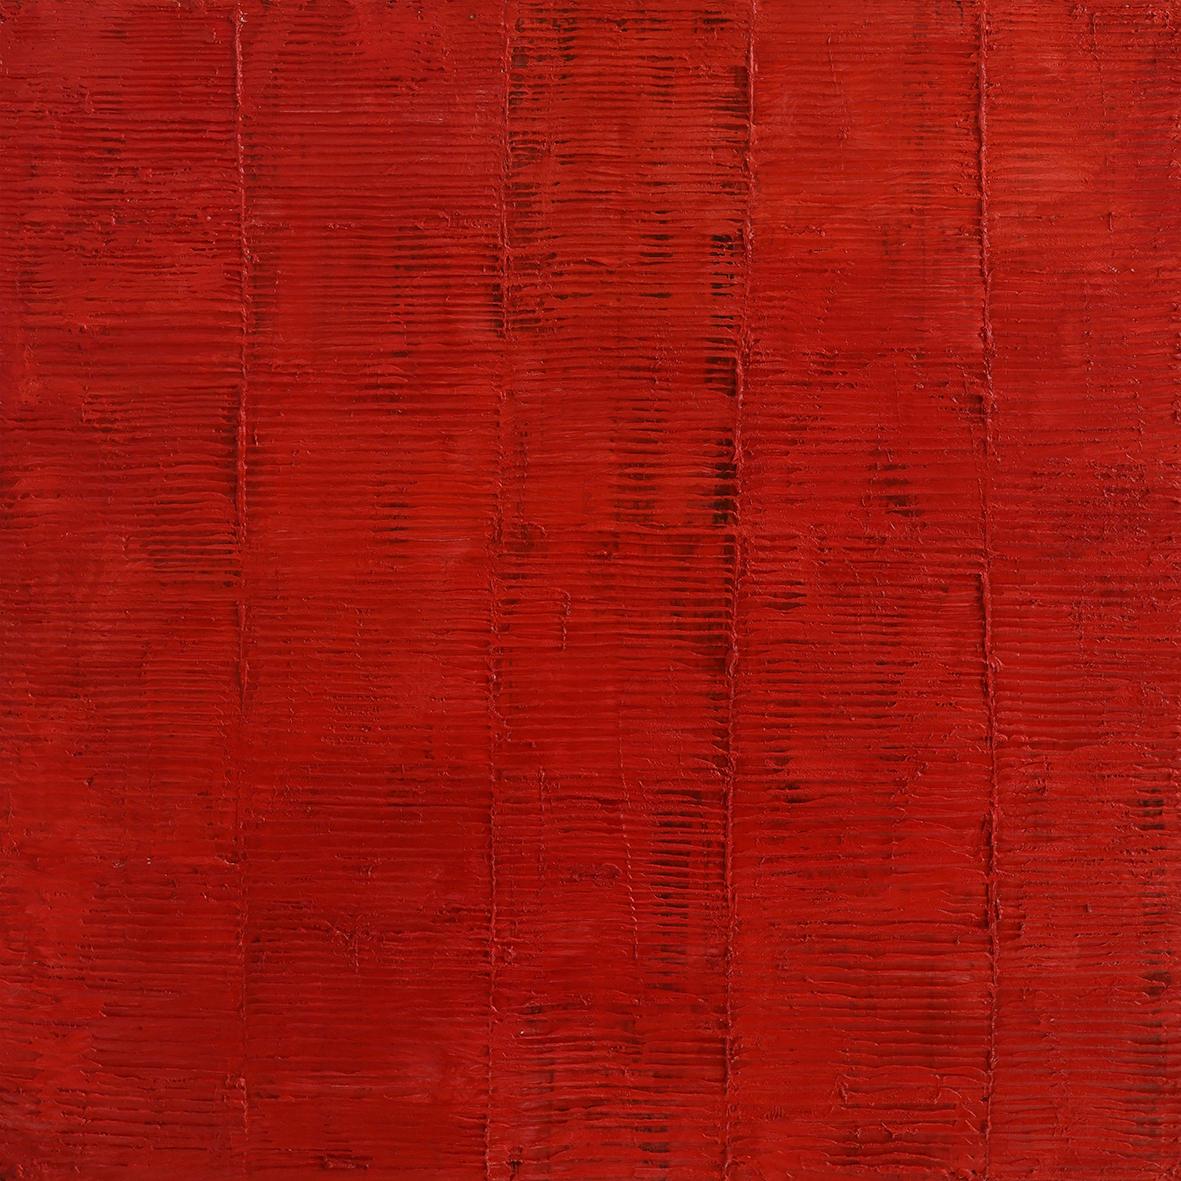 Öl auf Leinwand • 120 x 120 cm